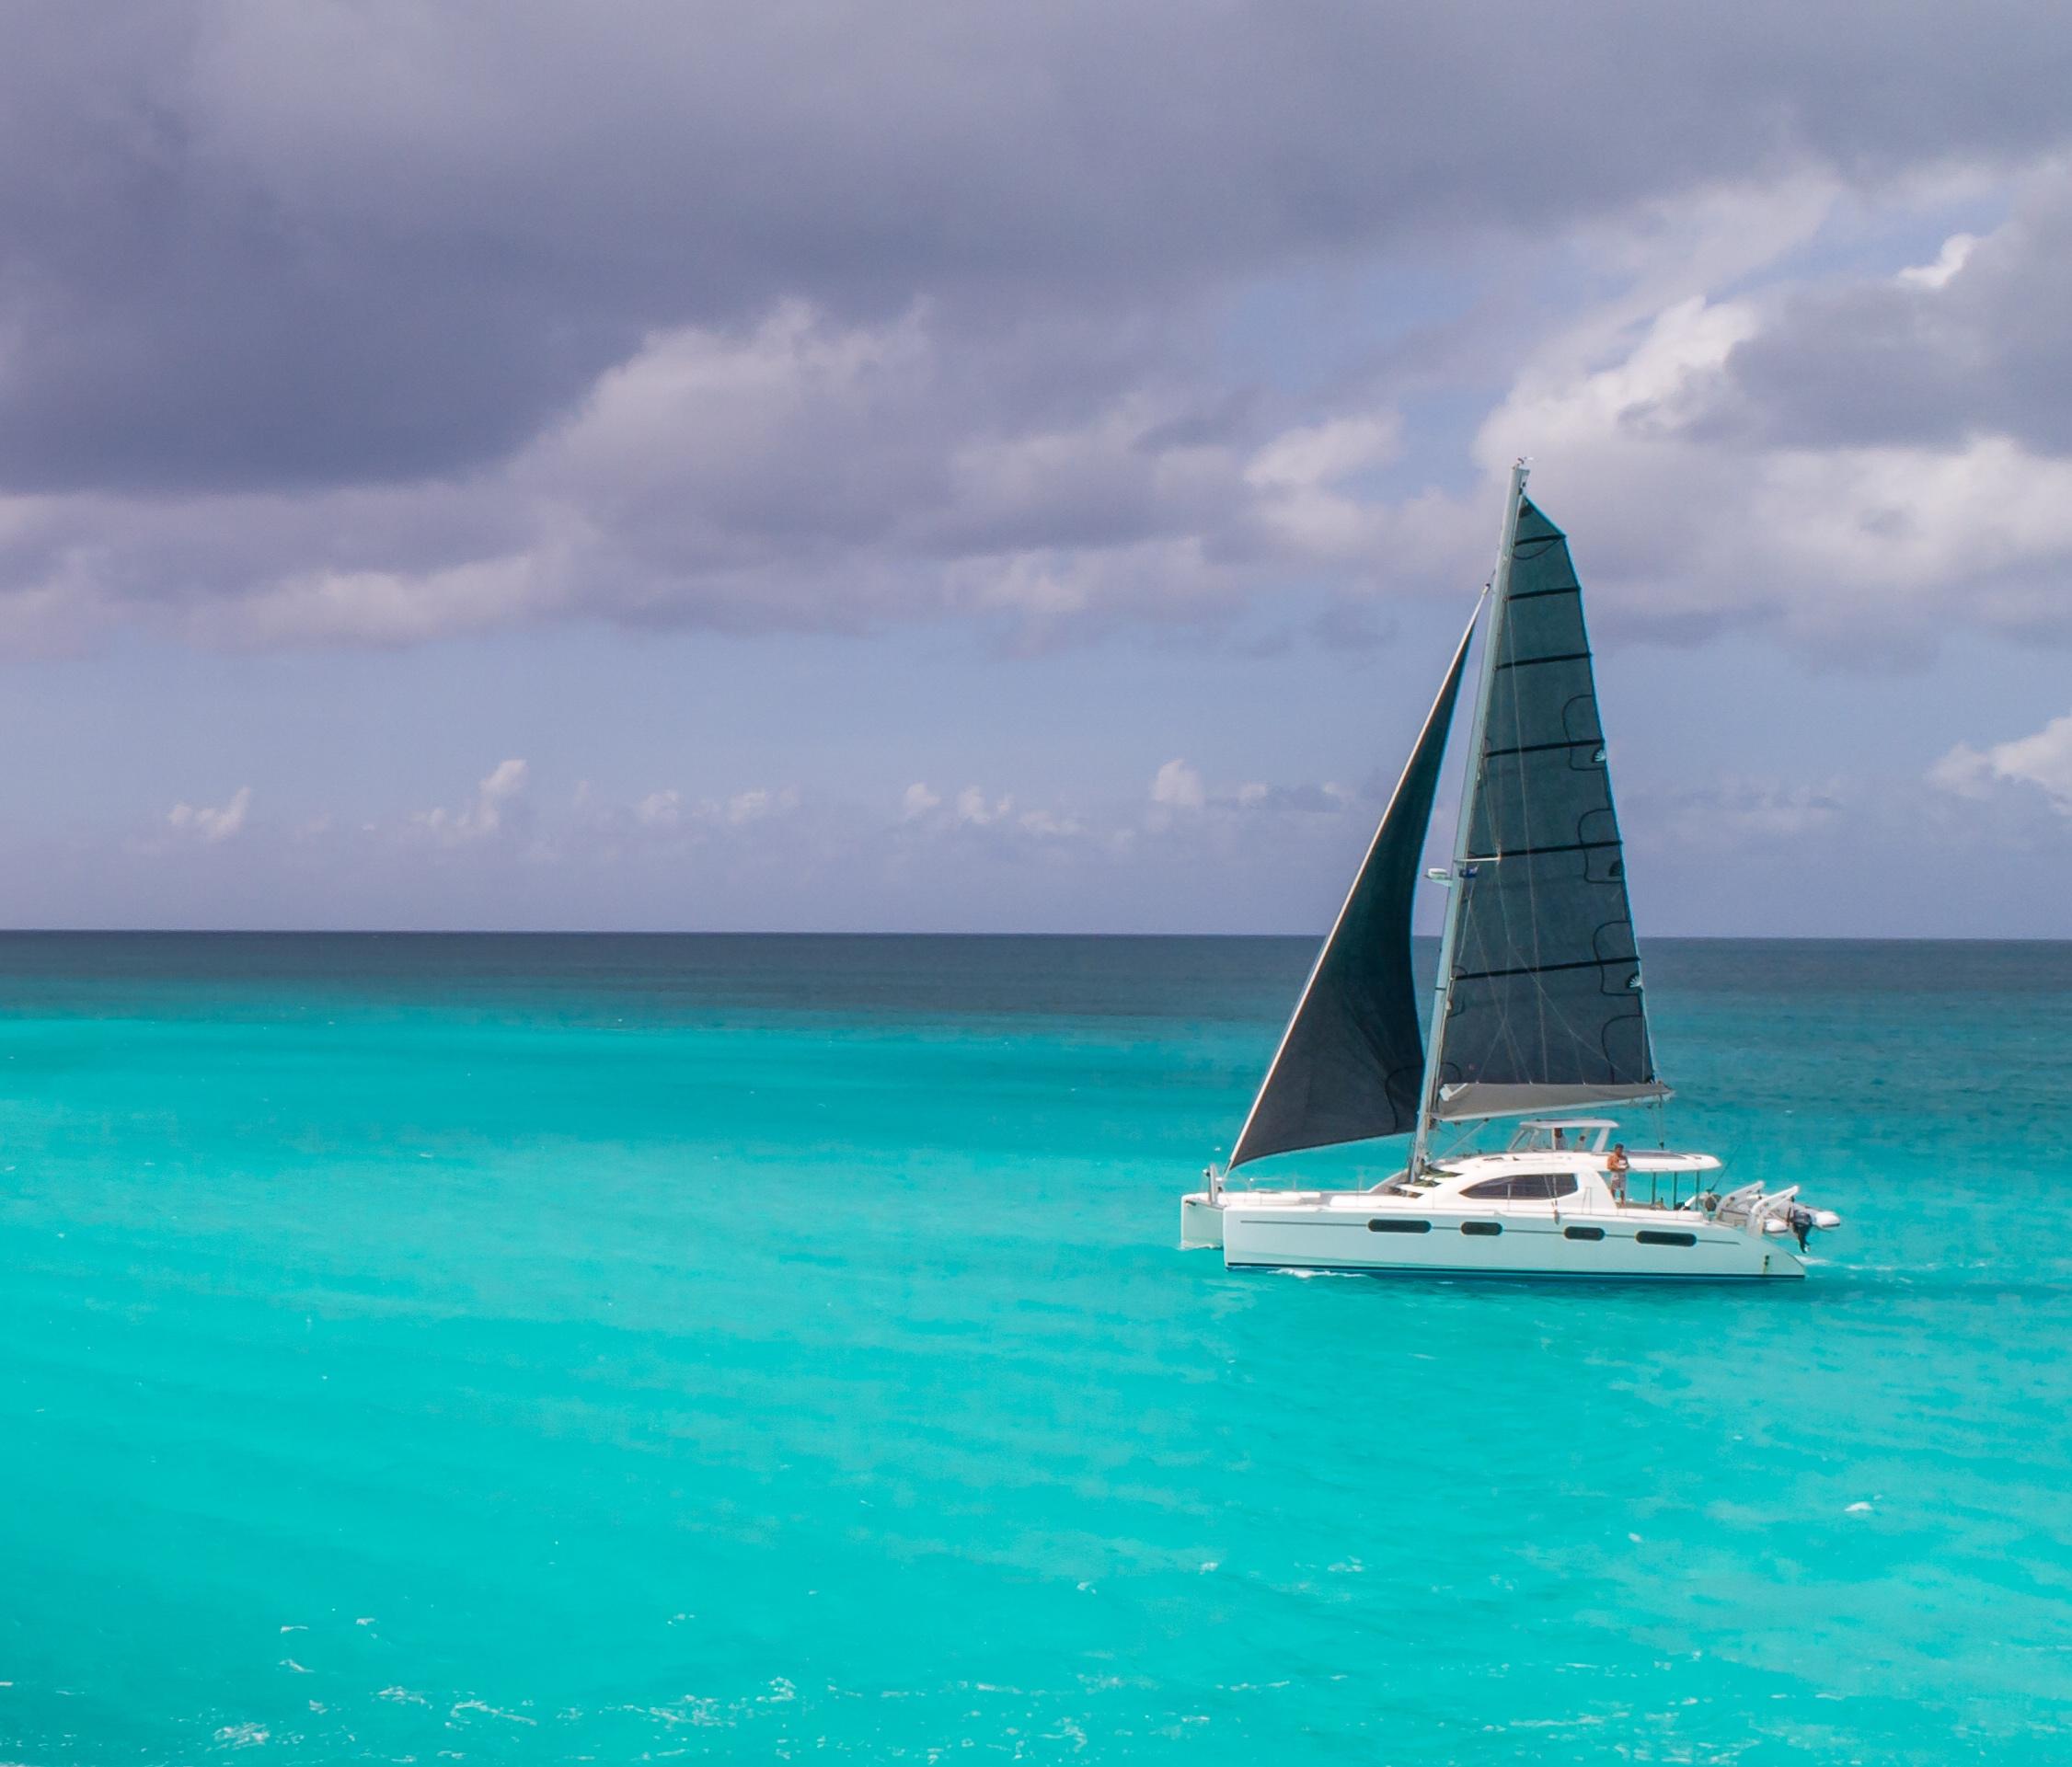 Bahamas Sailing Charter Turquoise sea